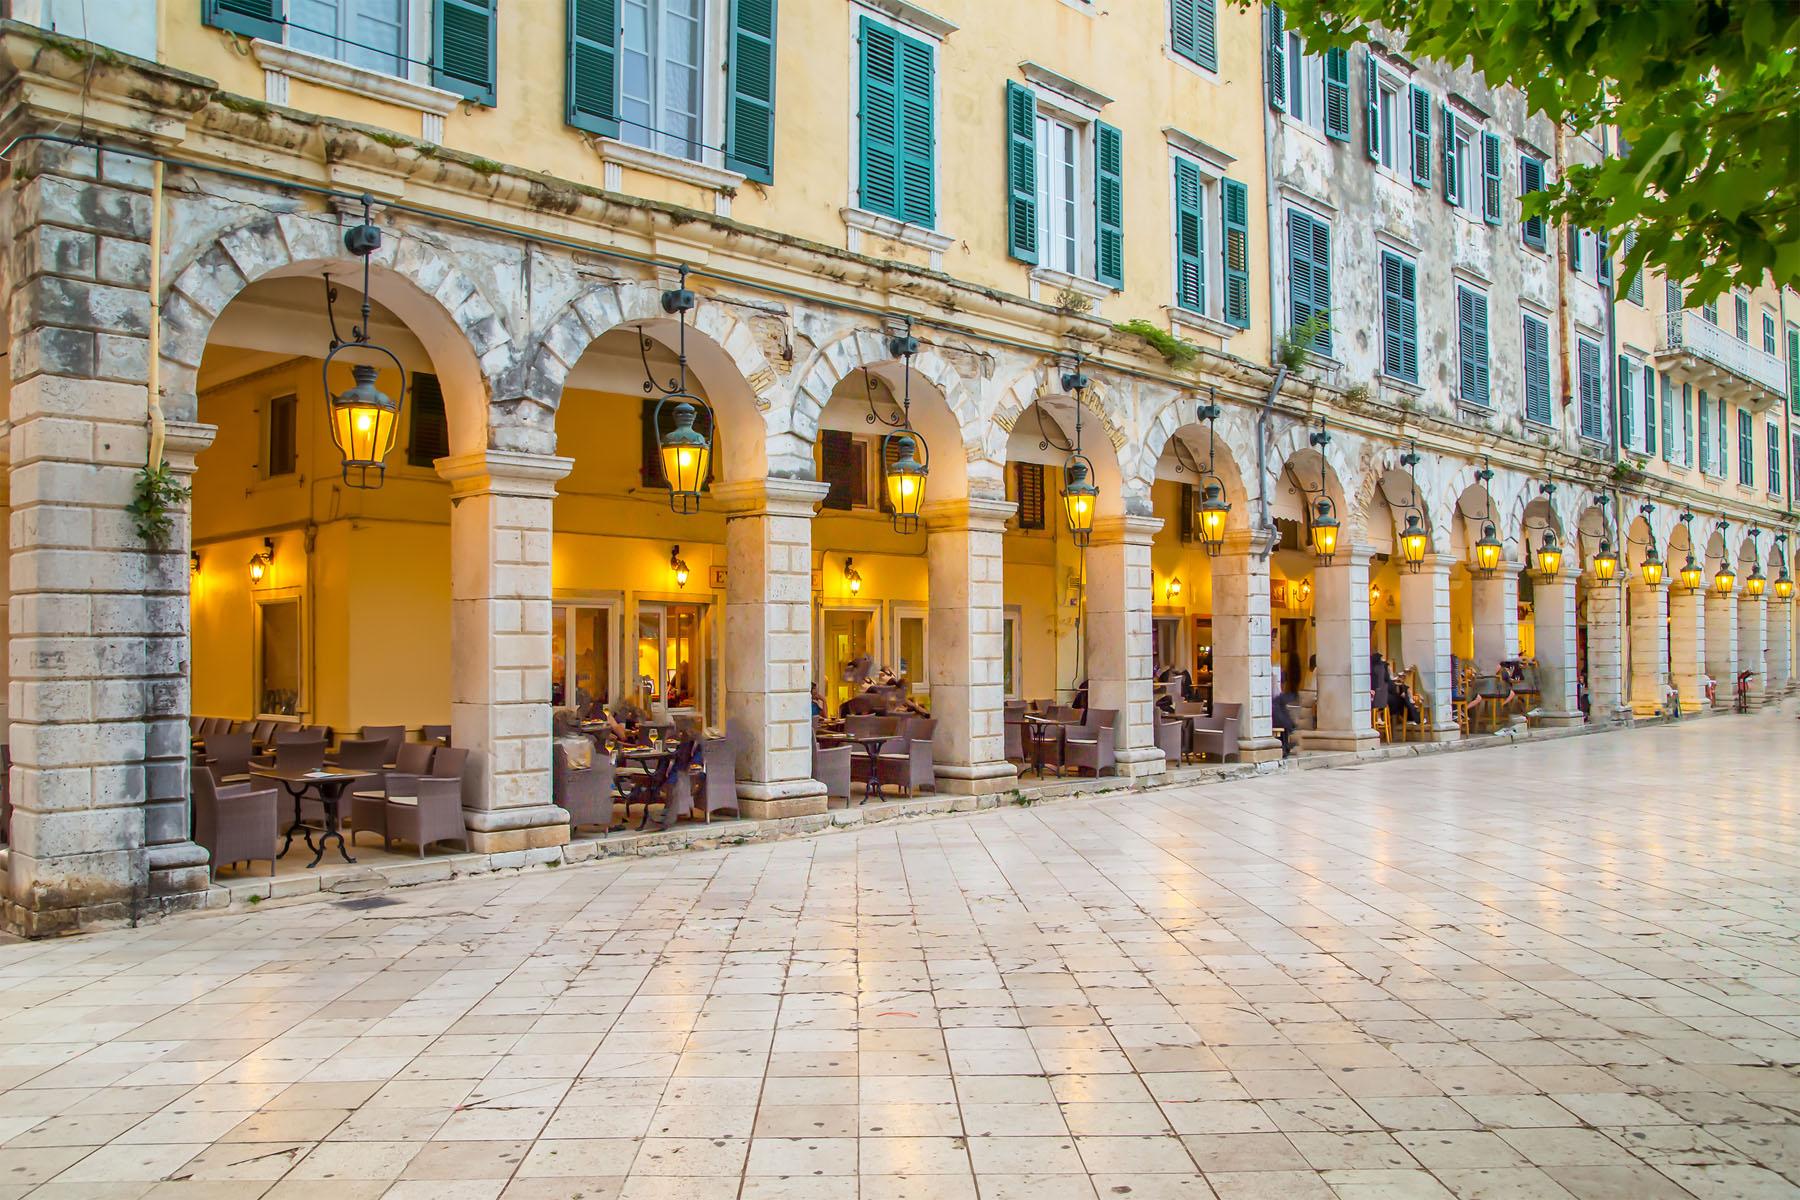 Corfu Liston evening time